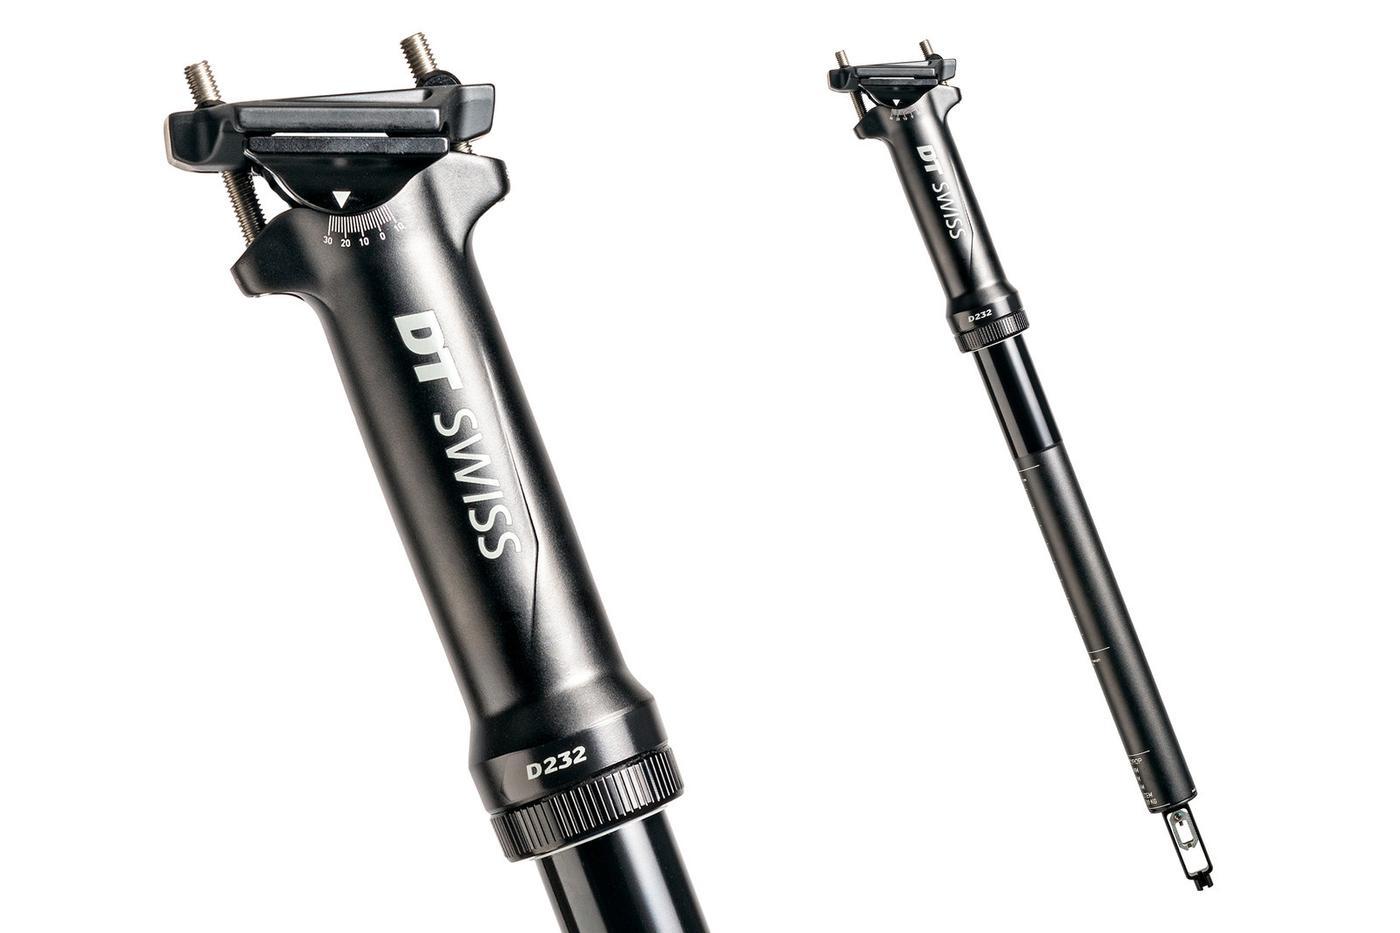 DT Swiss D 232 Alloy Dropper Cuts Price